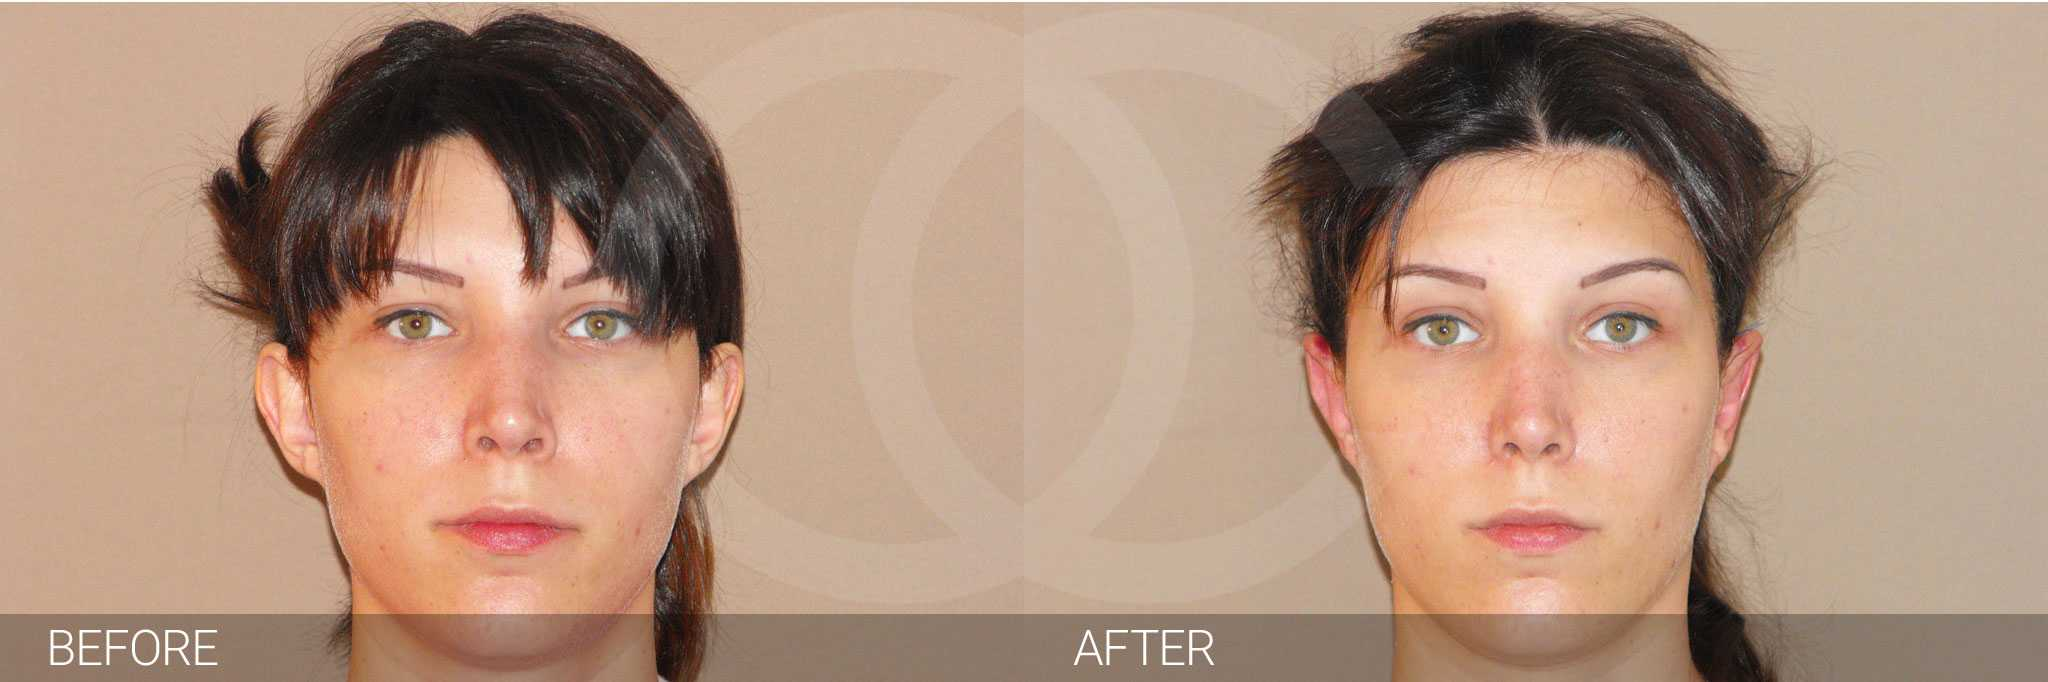 Chirurgie des oreilles 3 ante/post-op I